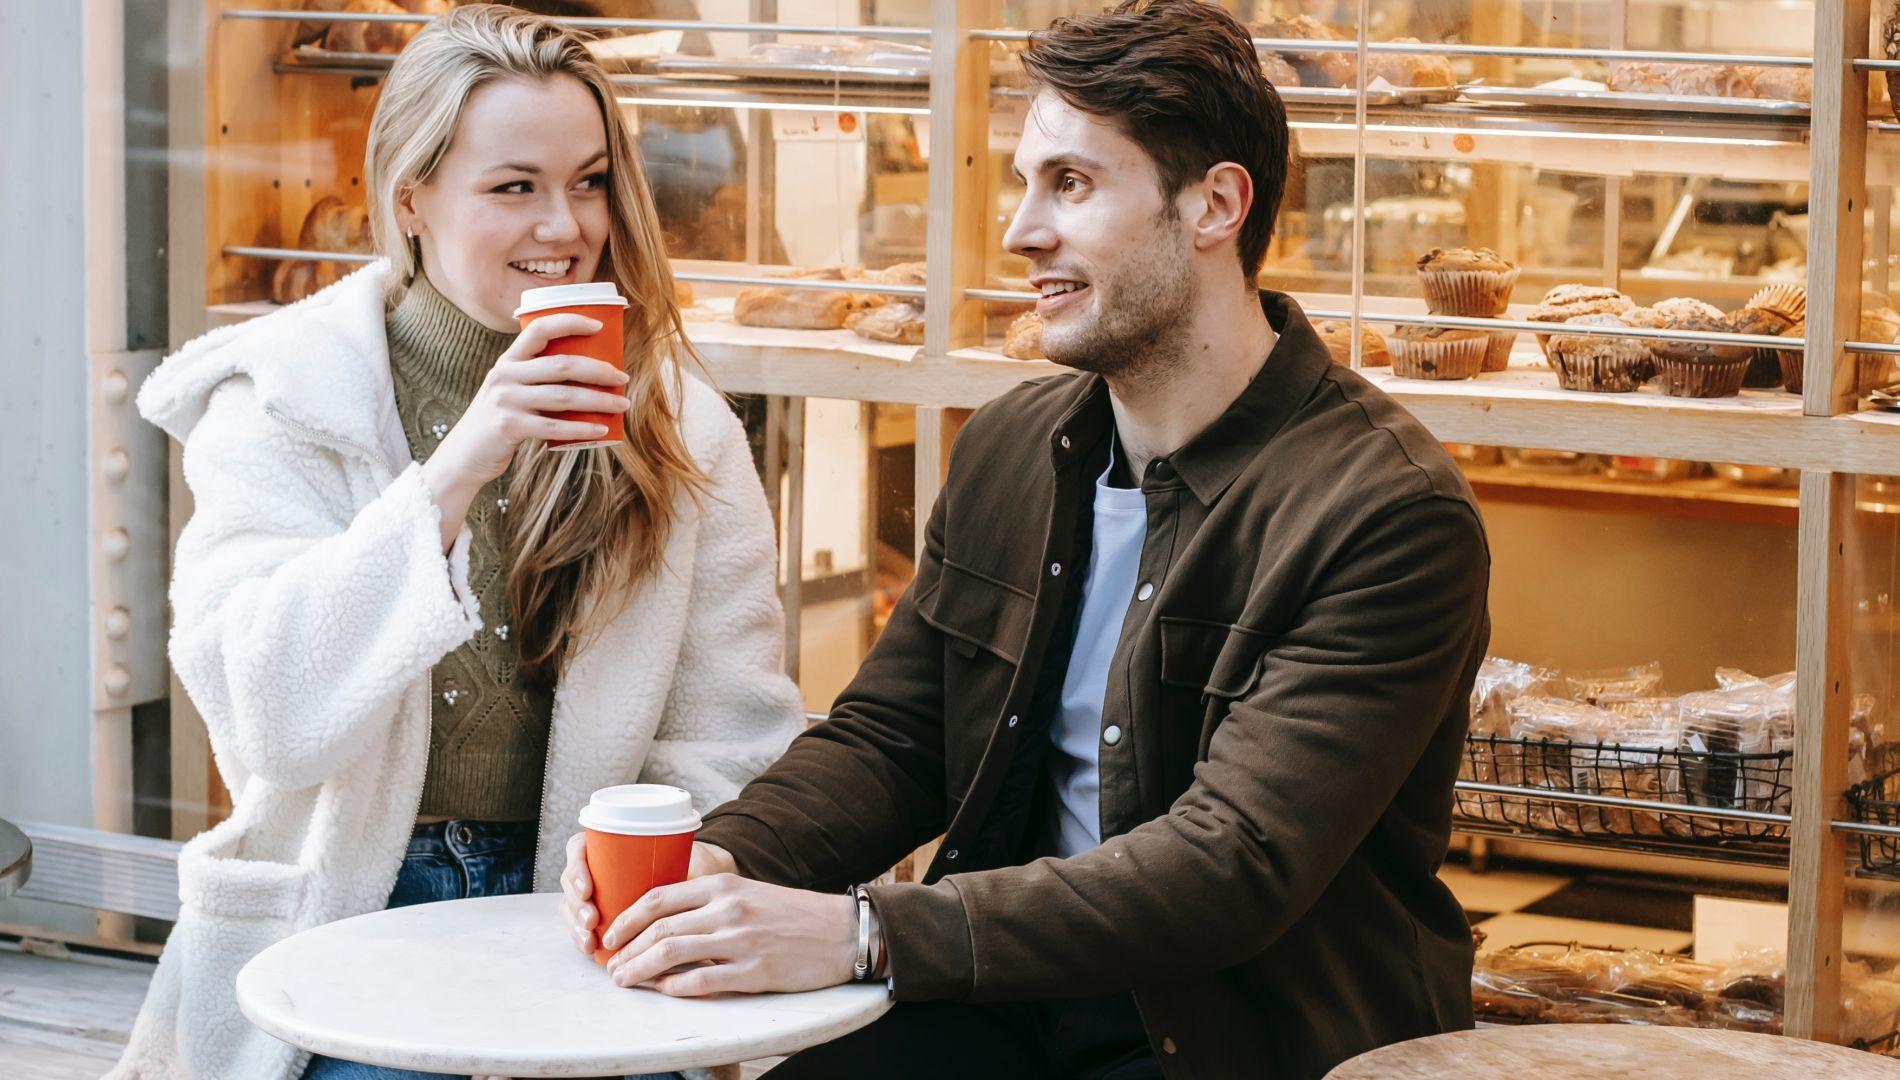 komunikacija, veza, odnosi